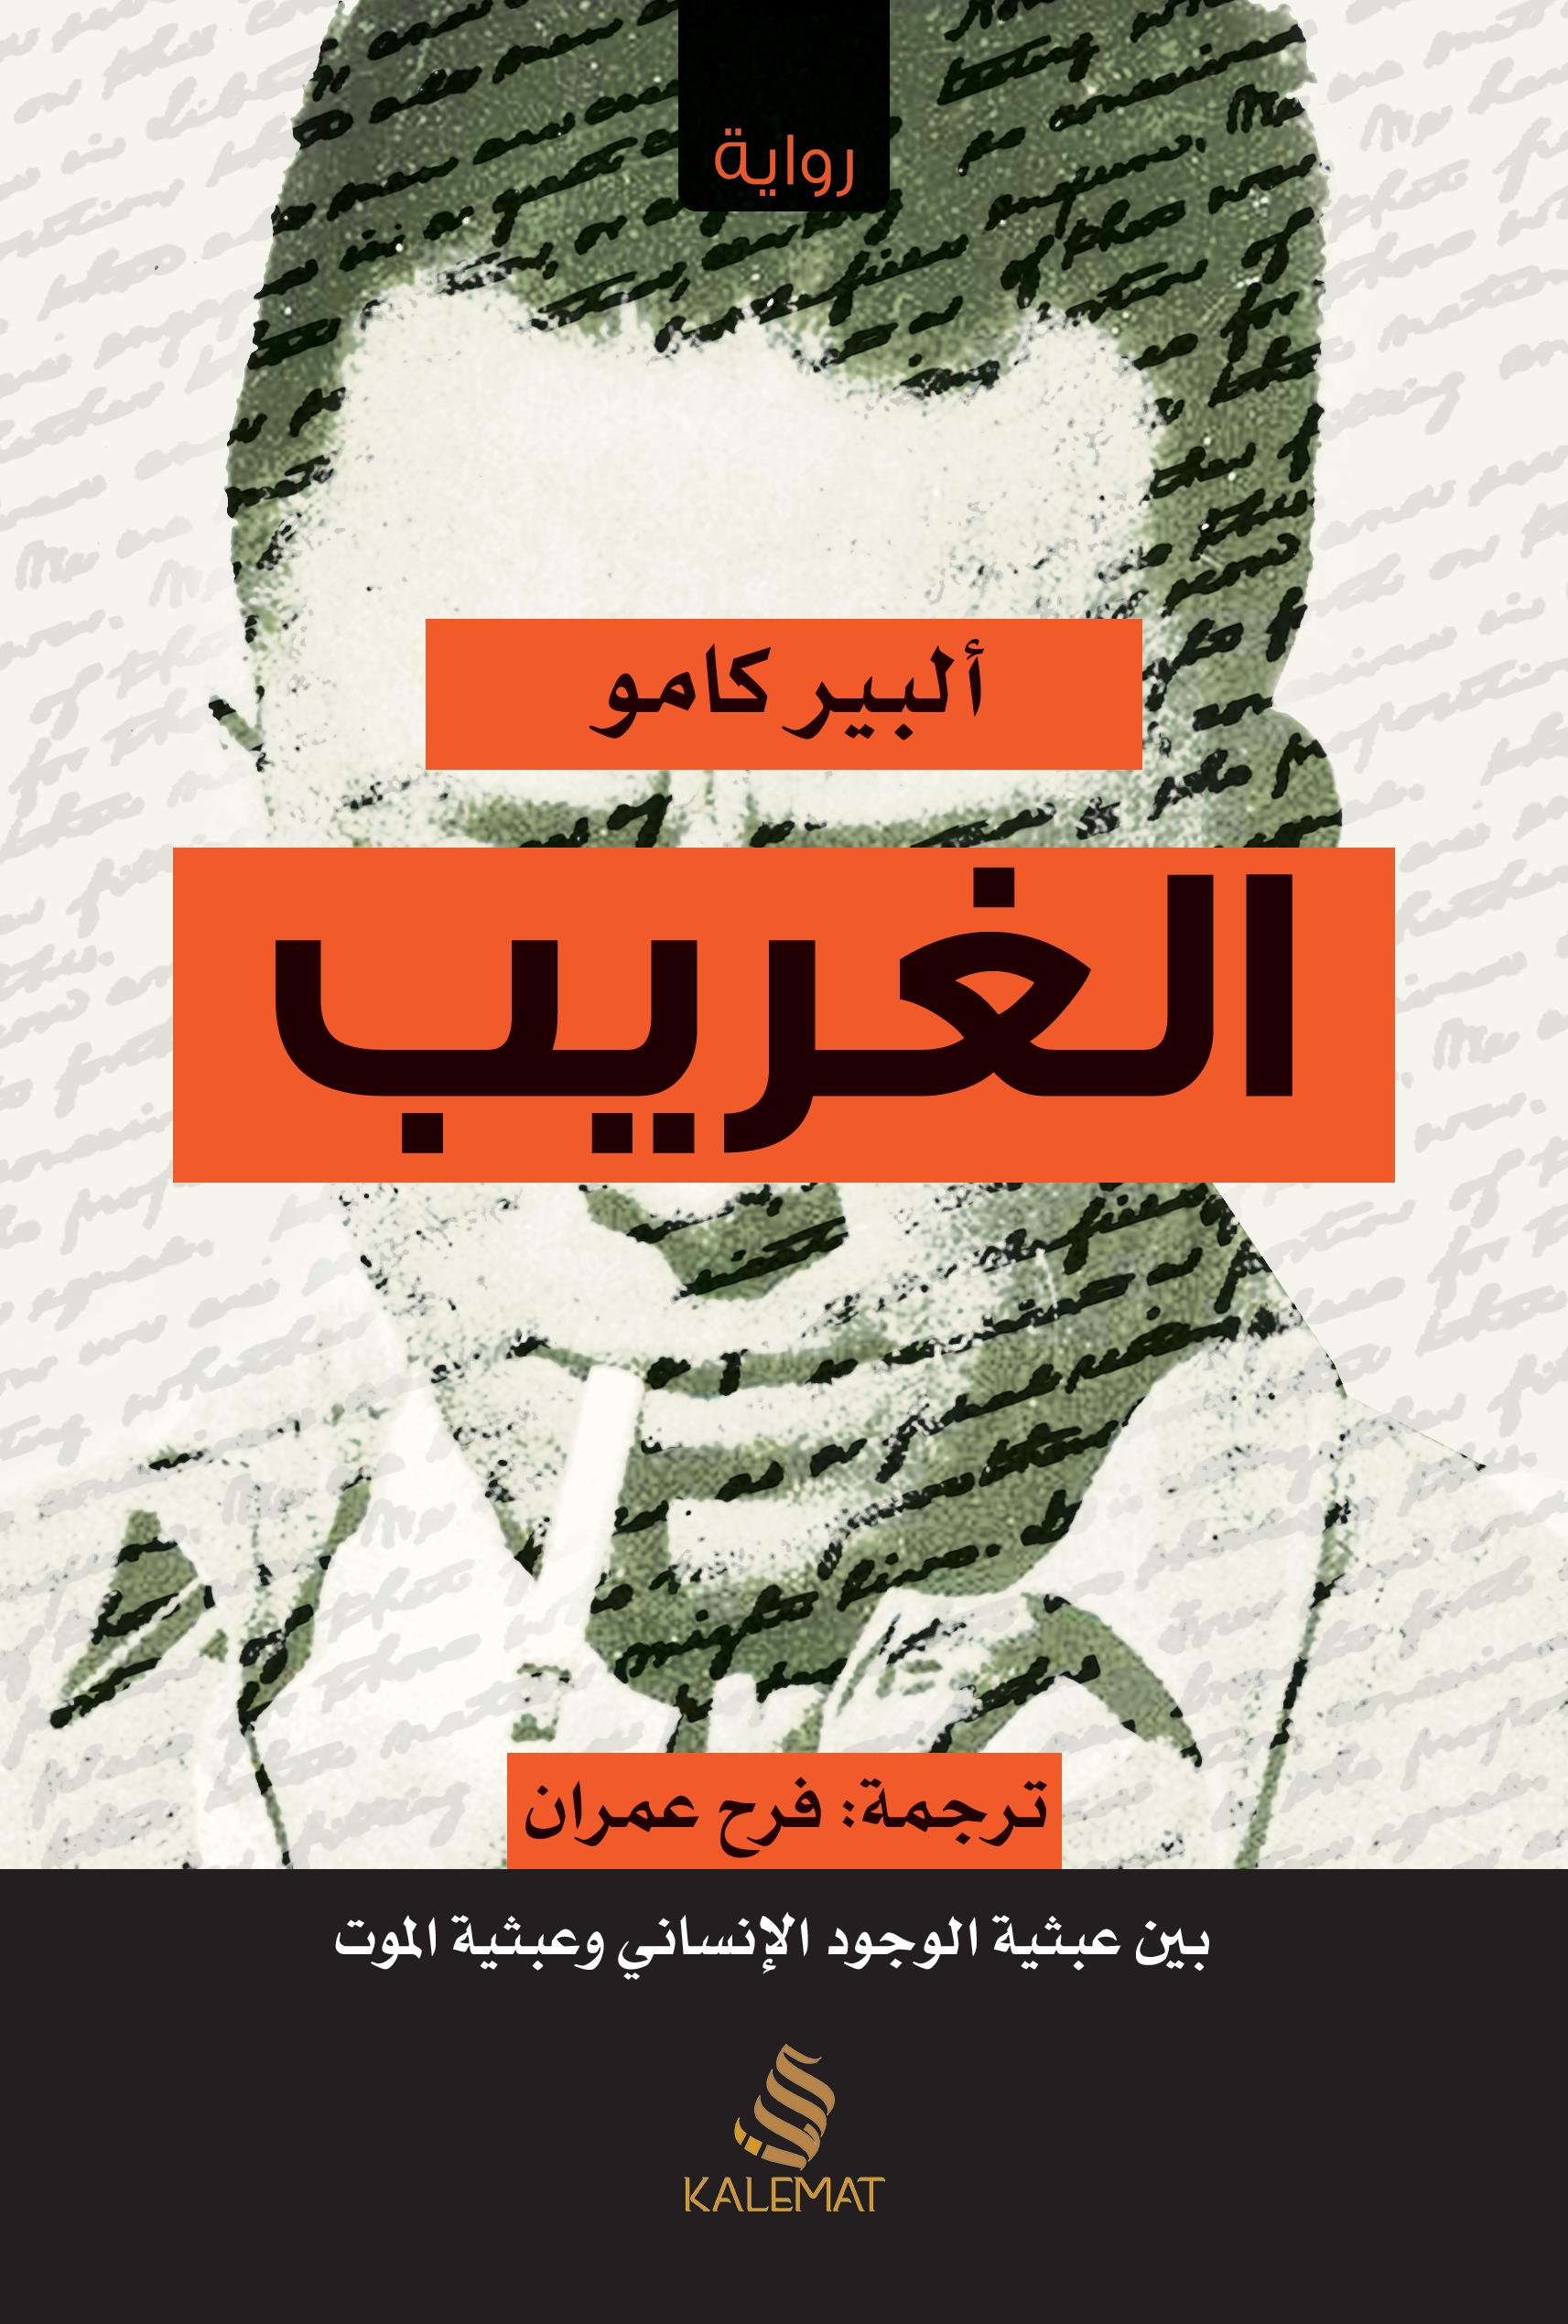 The Stranger By Albert Camus كتاب الغريب لـ ألبير كامو ترجمة فرح عمران إصدار دار كلمات My Books Poster Books